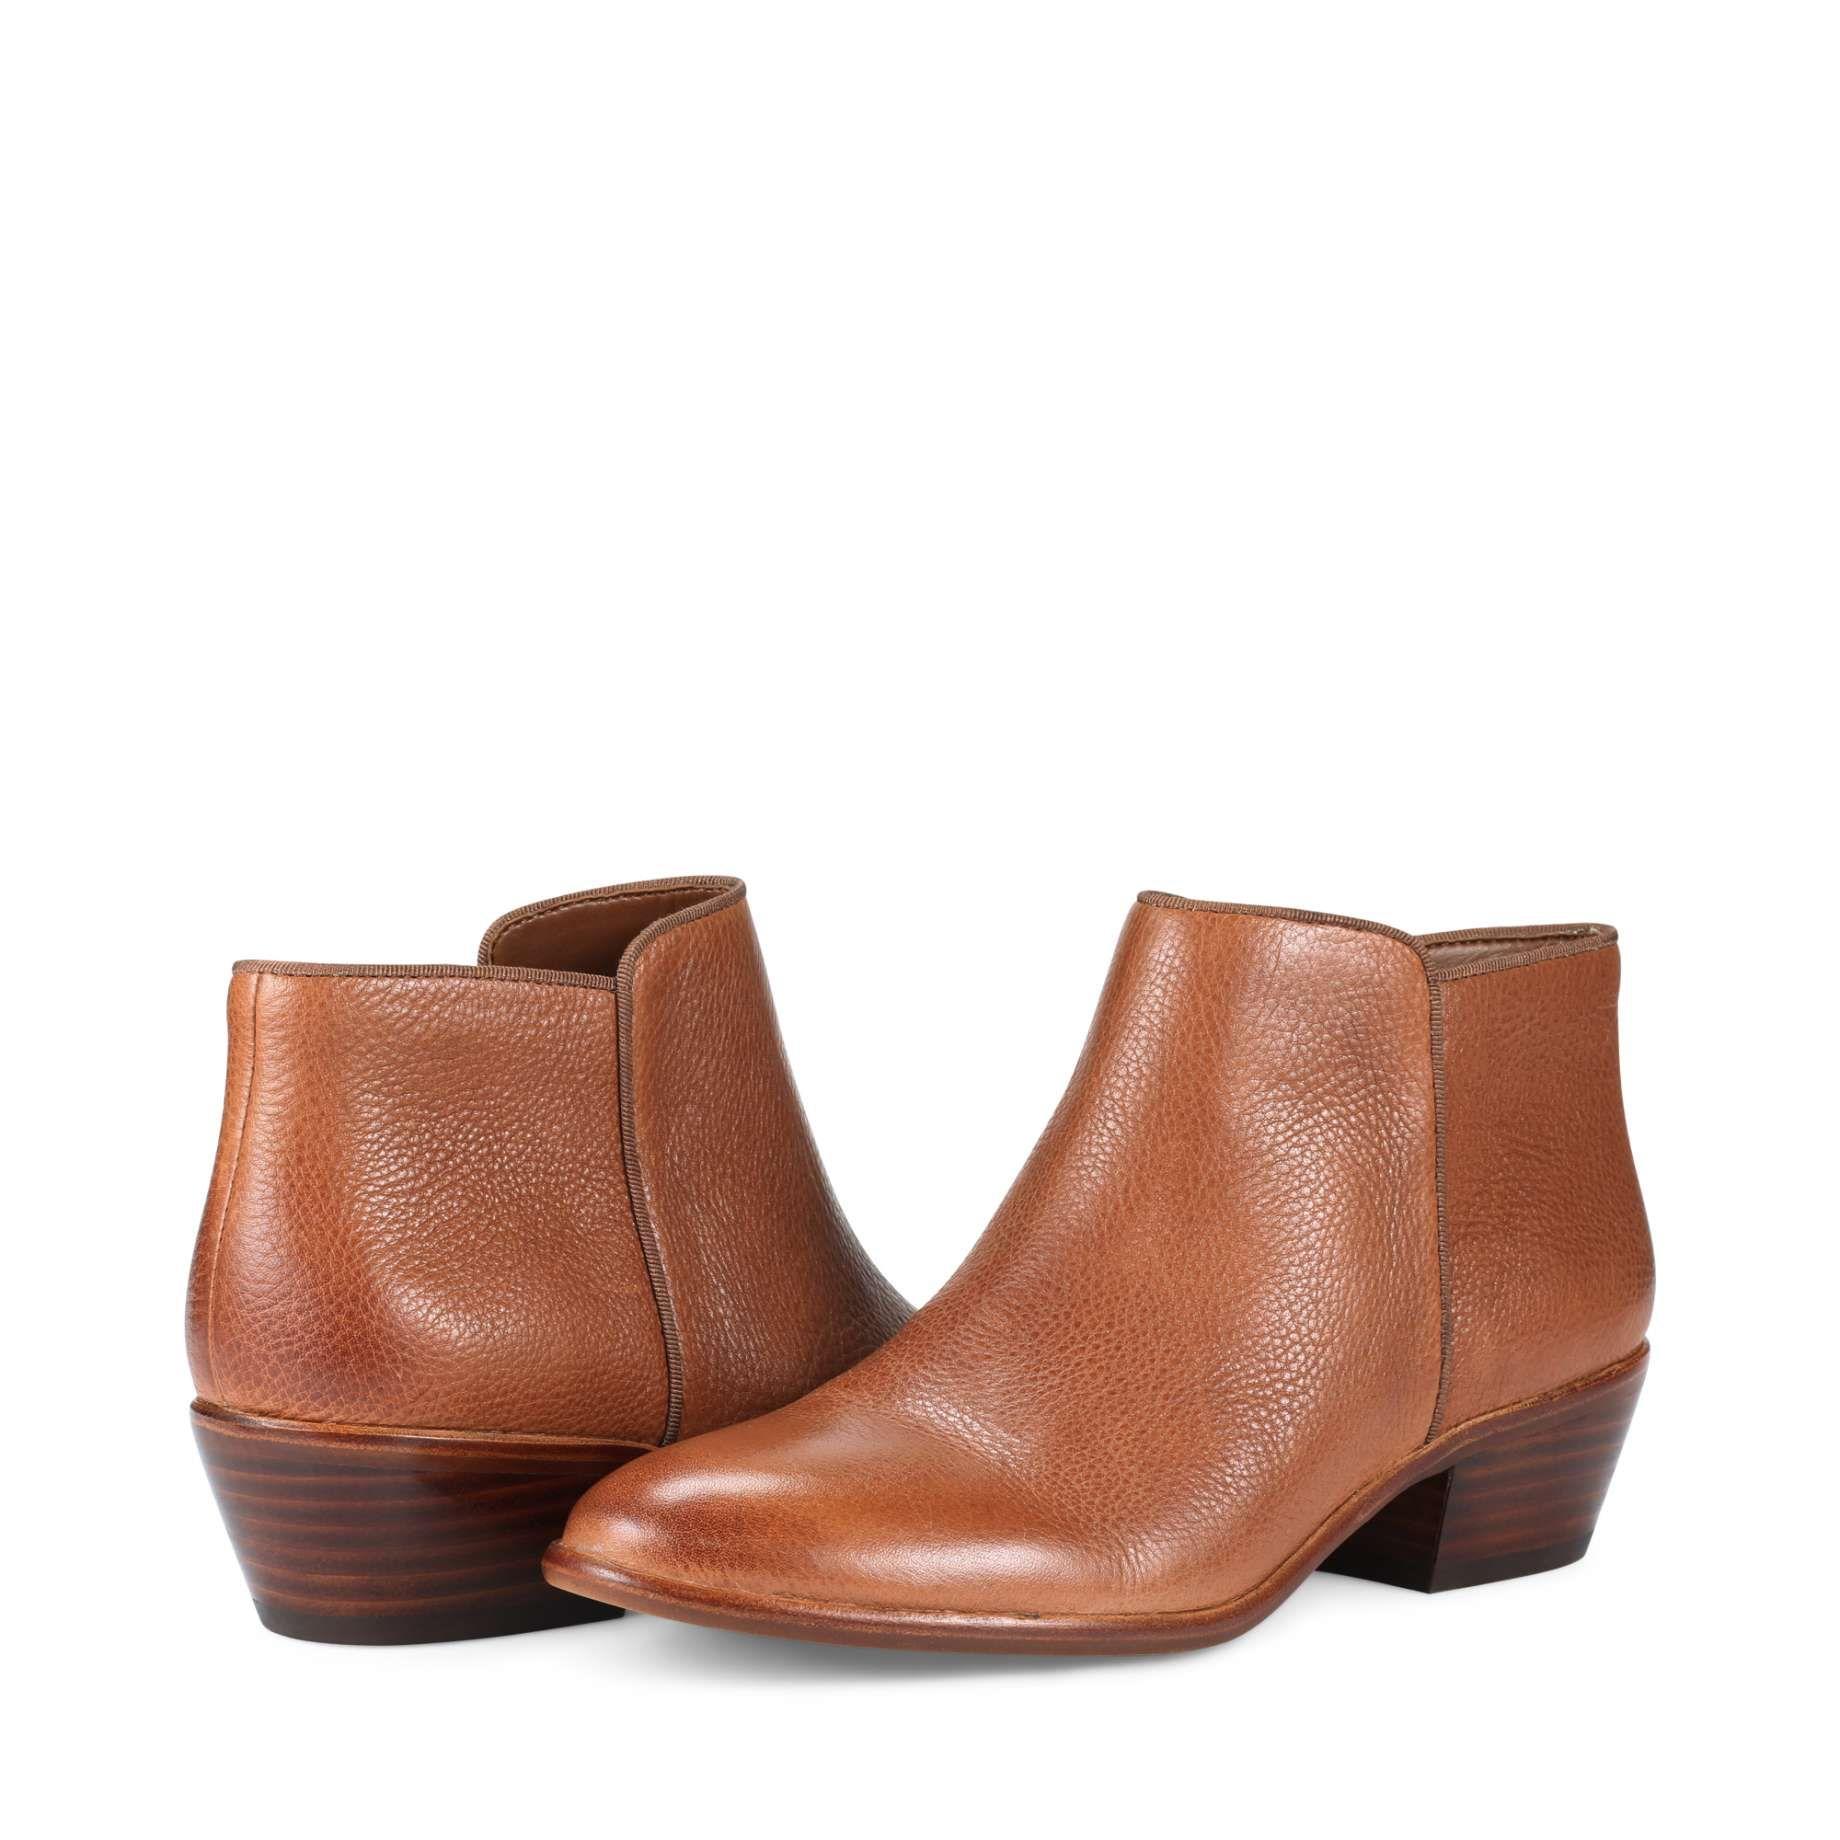 eaebc7bf93300 Women s Sam Edelman Petty Deep Saddle Leather SamEdelman.com